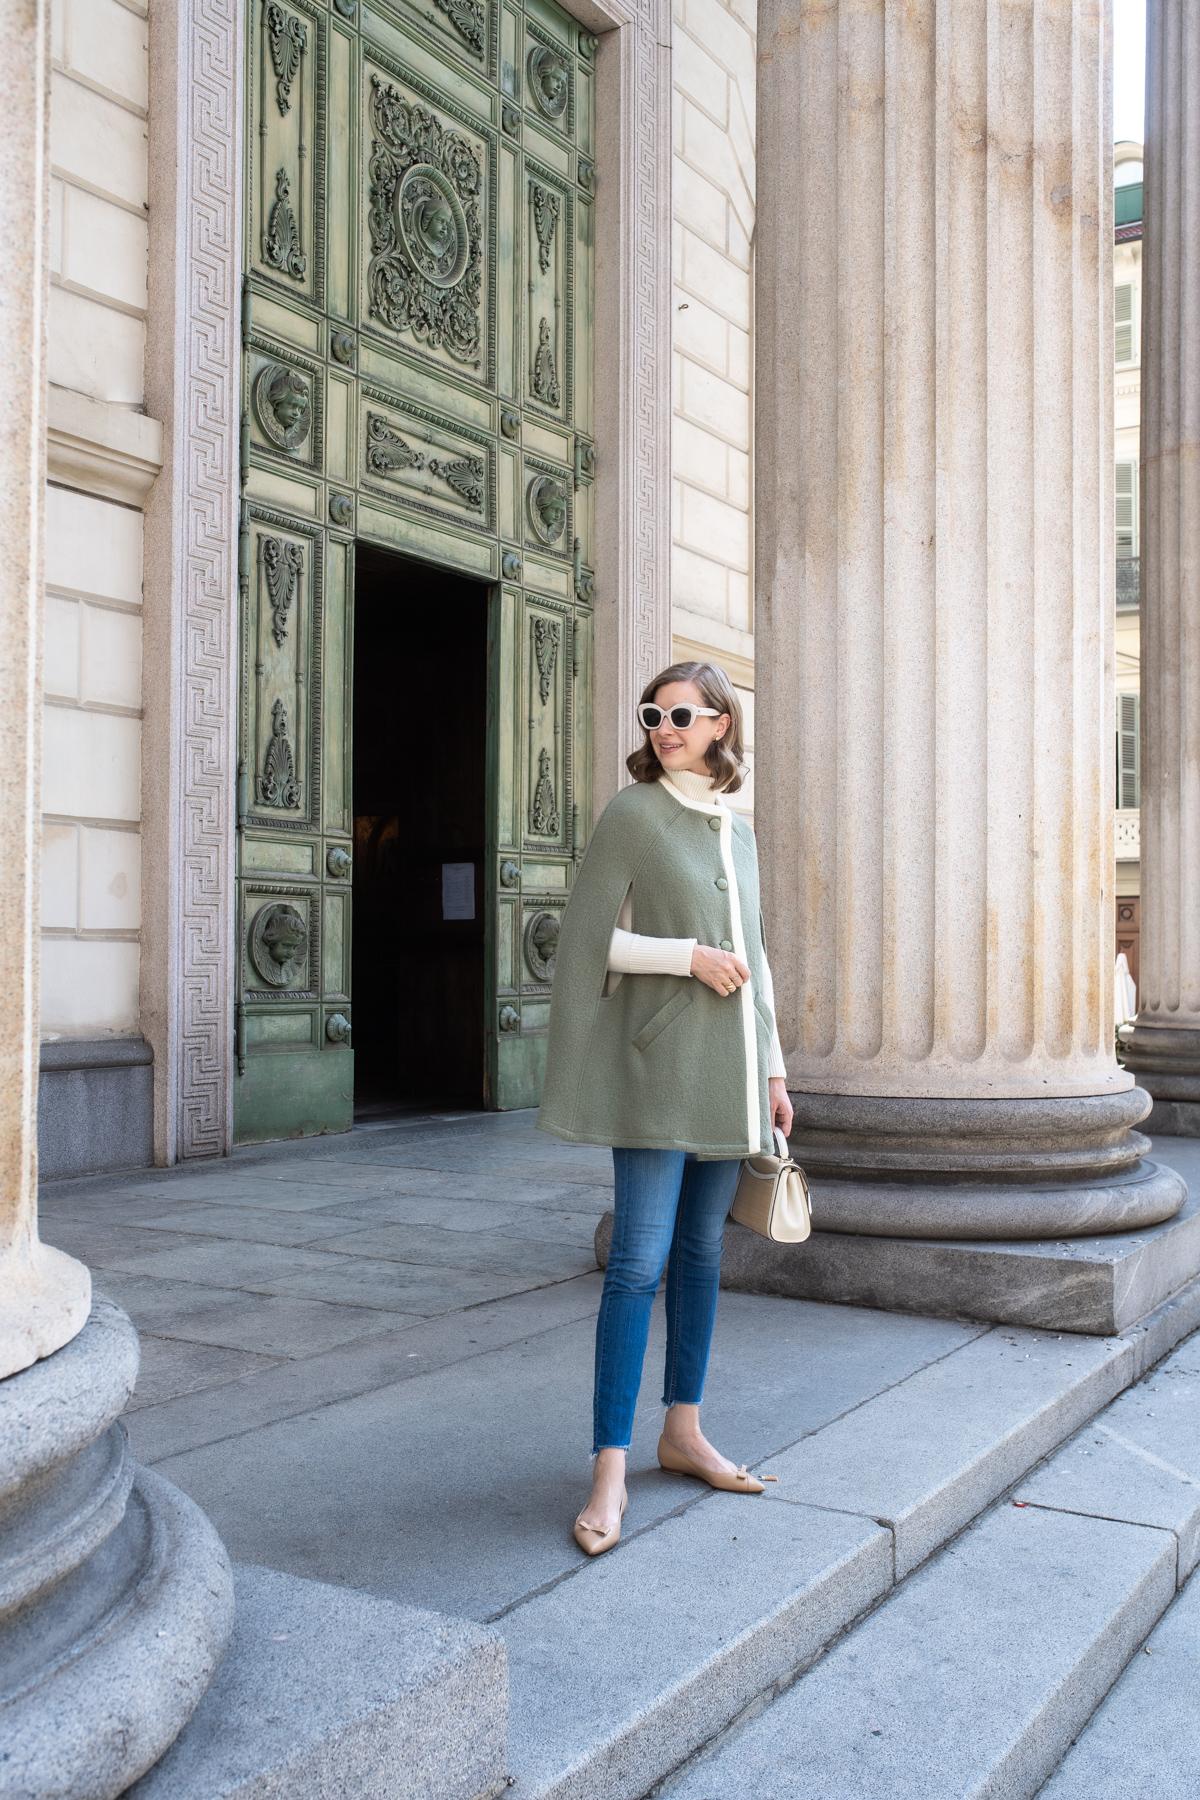 Stacie Flinner x Marta Scarampi Limited Edition Cape Collection-61.jpg